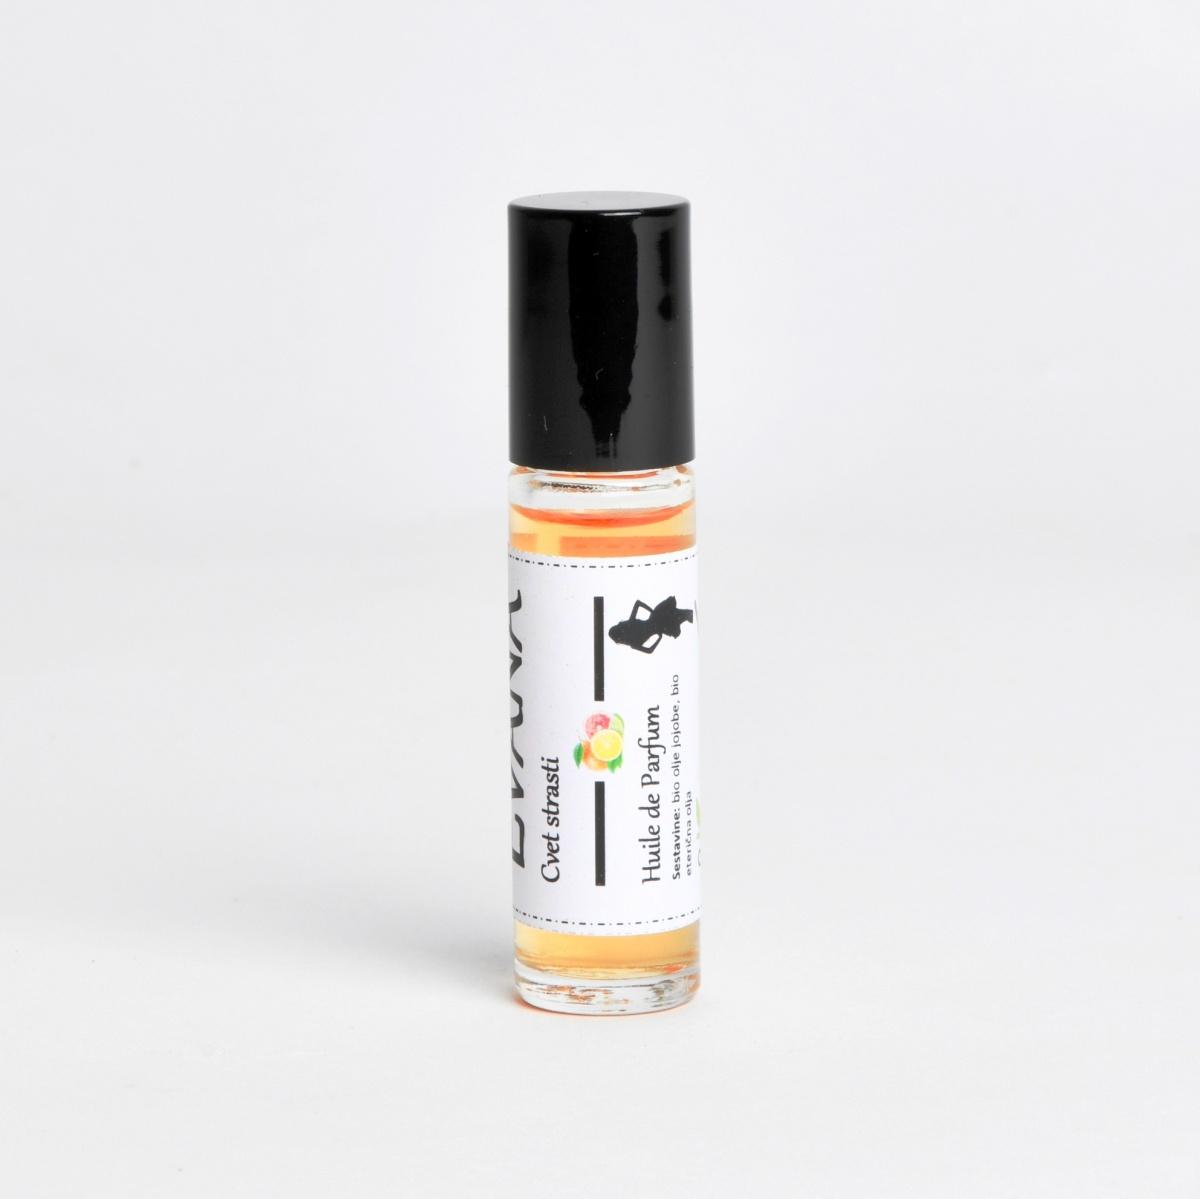 BIO huile de parfum 06 09 03 010